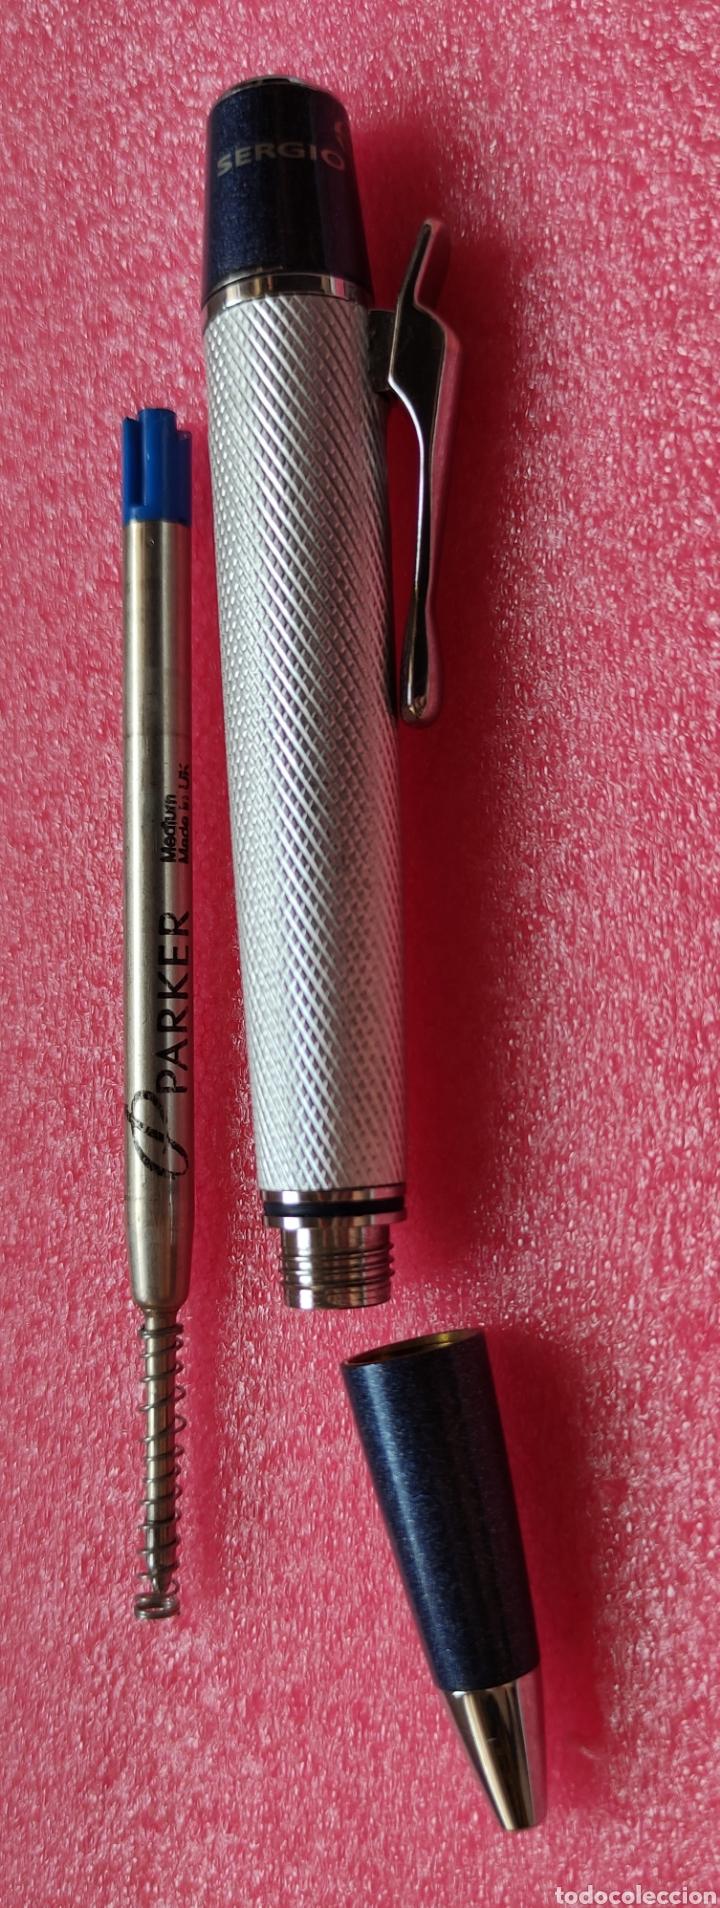 Bolígrafos antiguos: Bolígrafo SERGIO TACCHINI - Foto 5 - 261844705